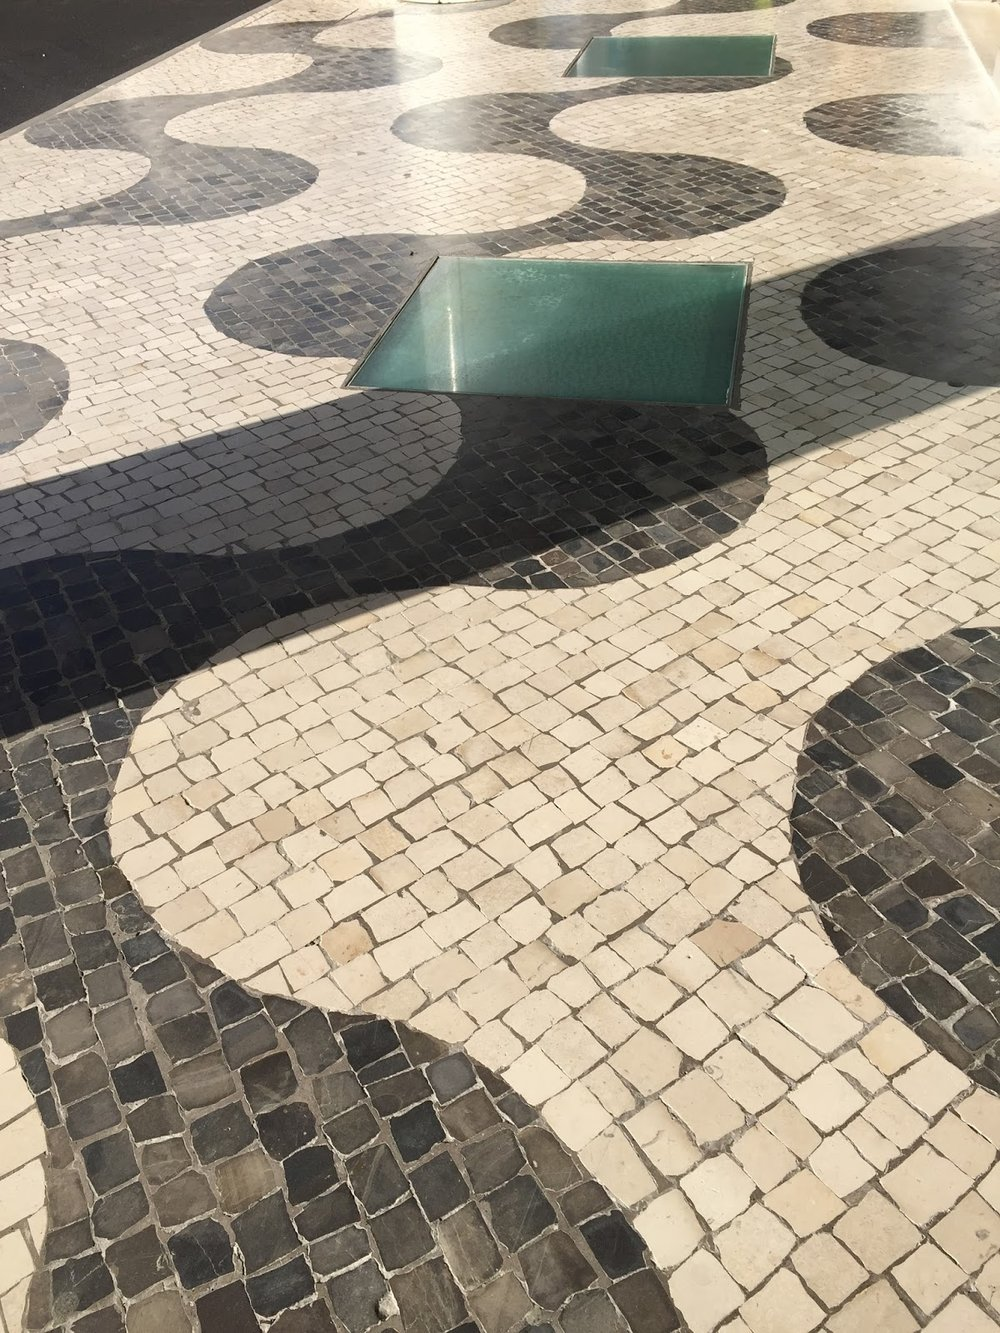 Forma sinuosa na calçada do aeroporto, Funchal, Ilha da Madeira